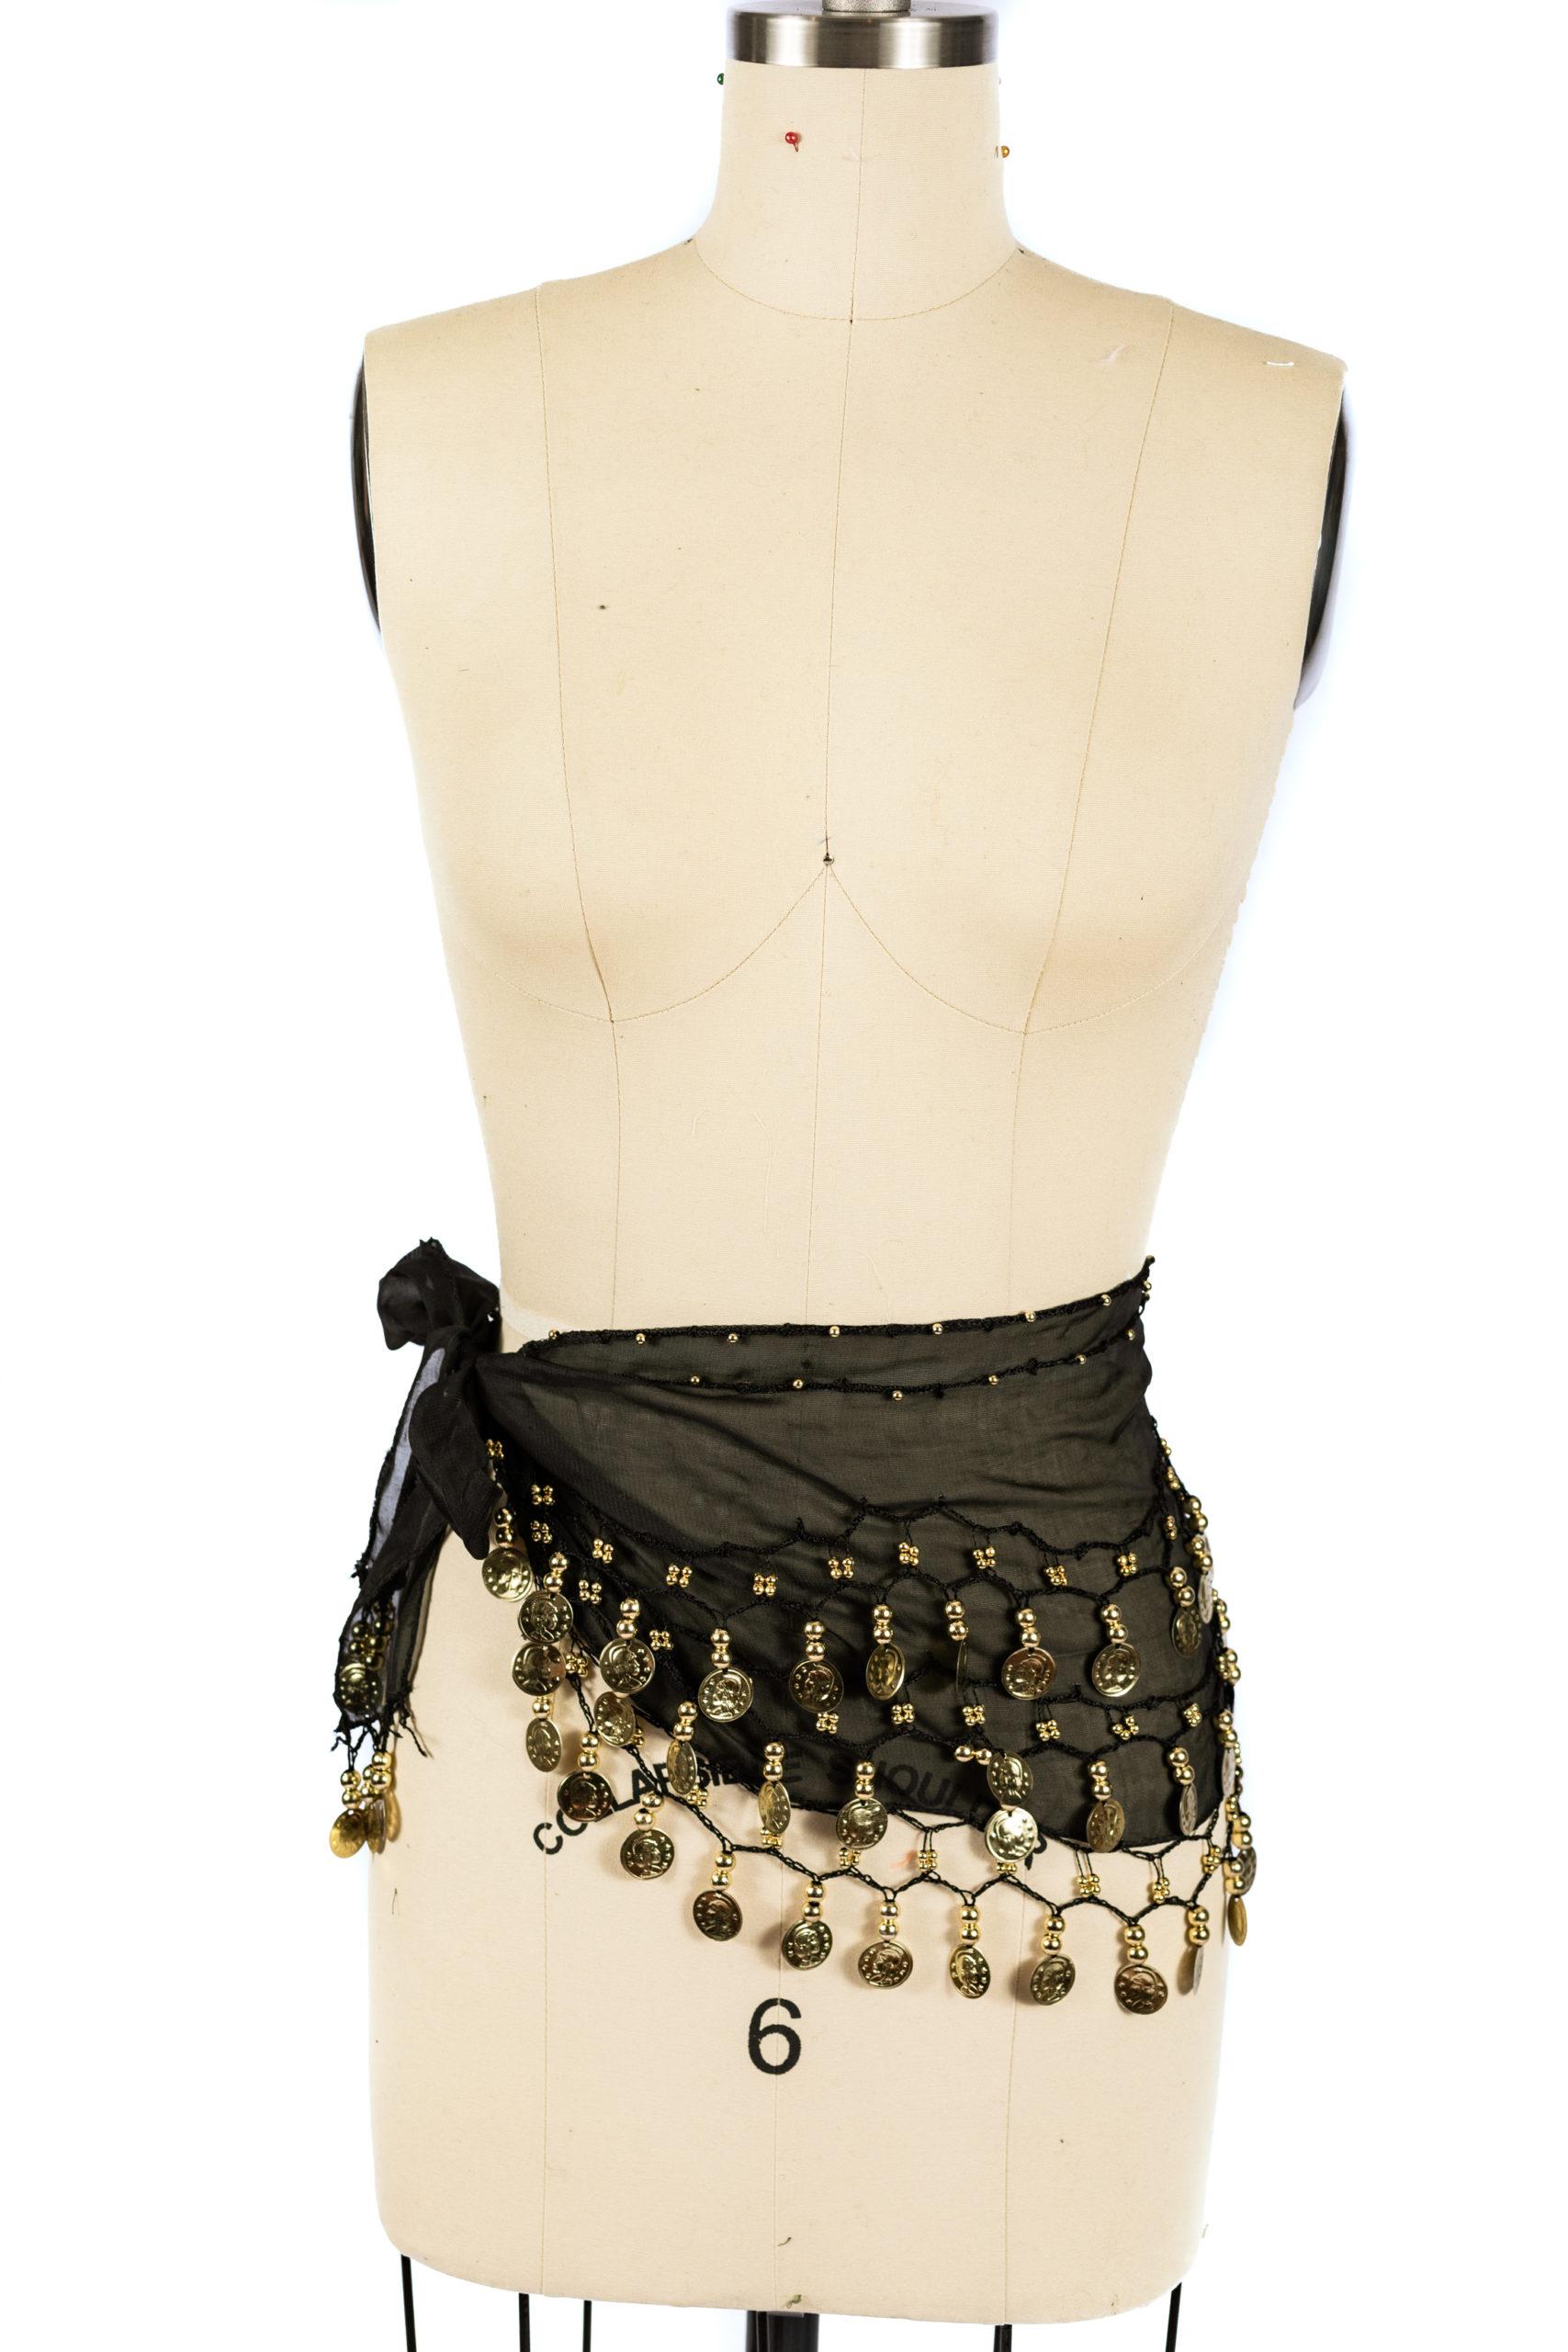 Belly dancing sash